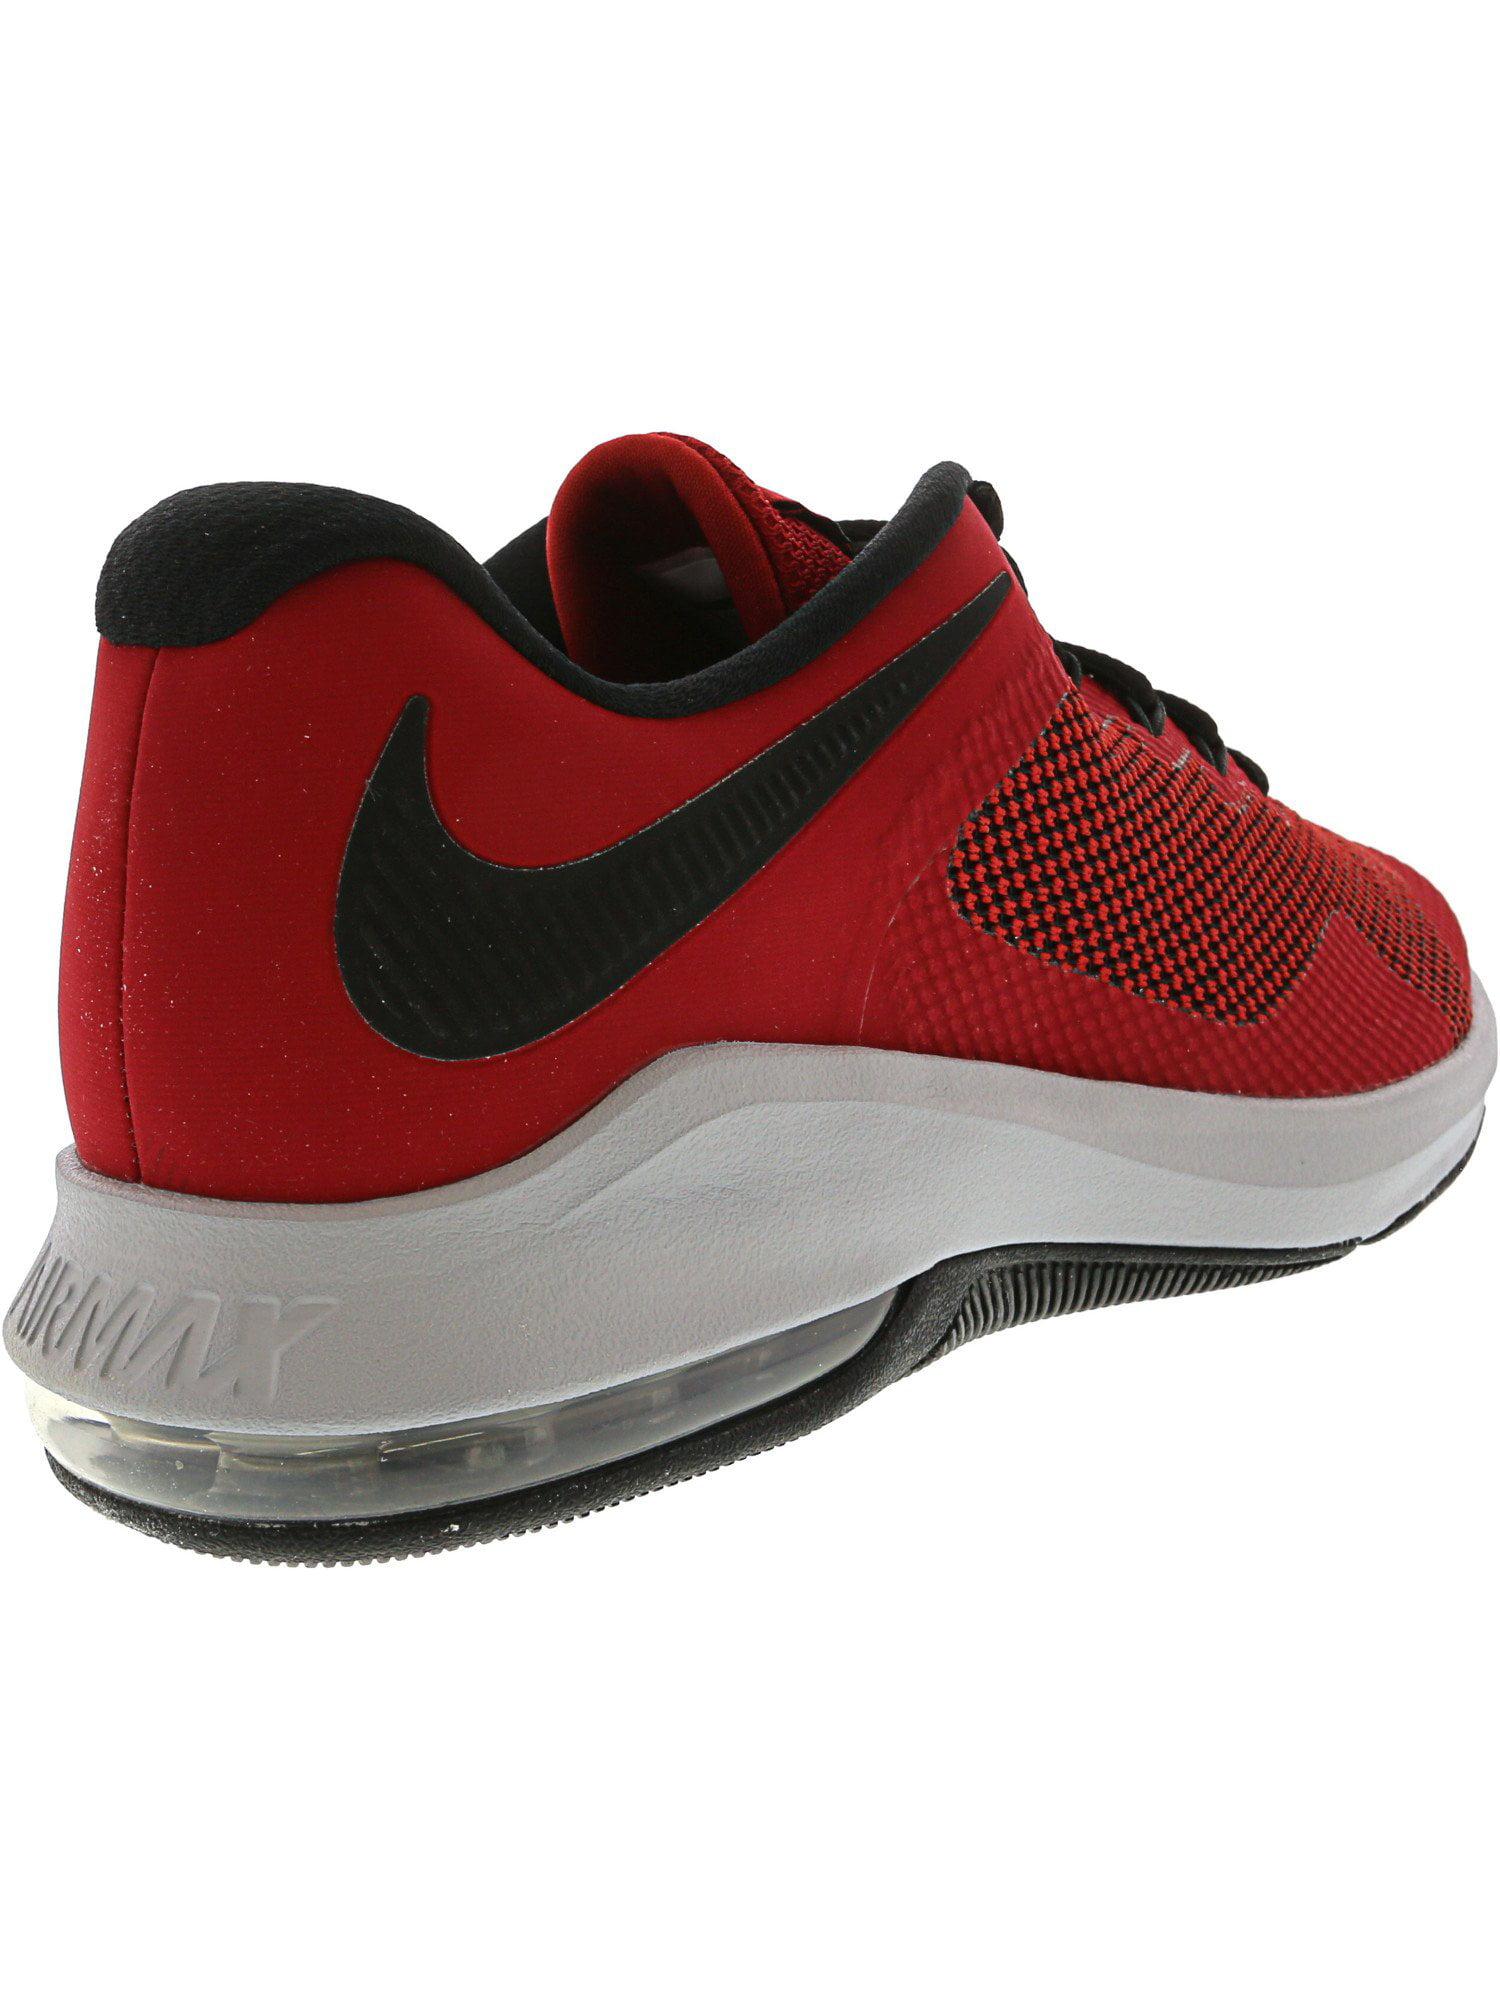 Nike Men's Air Max Alpha Trainer Gym